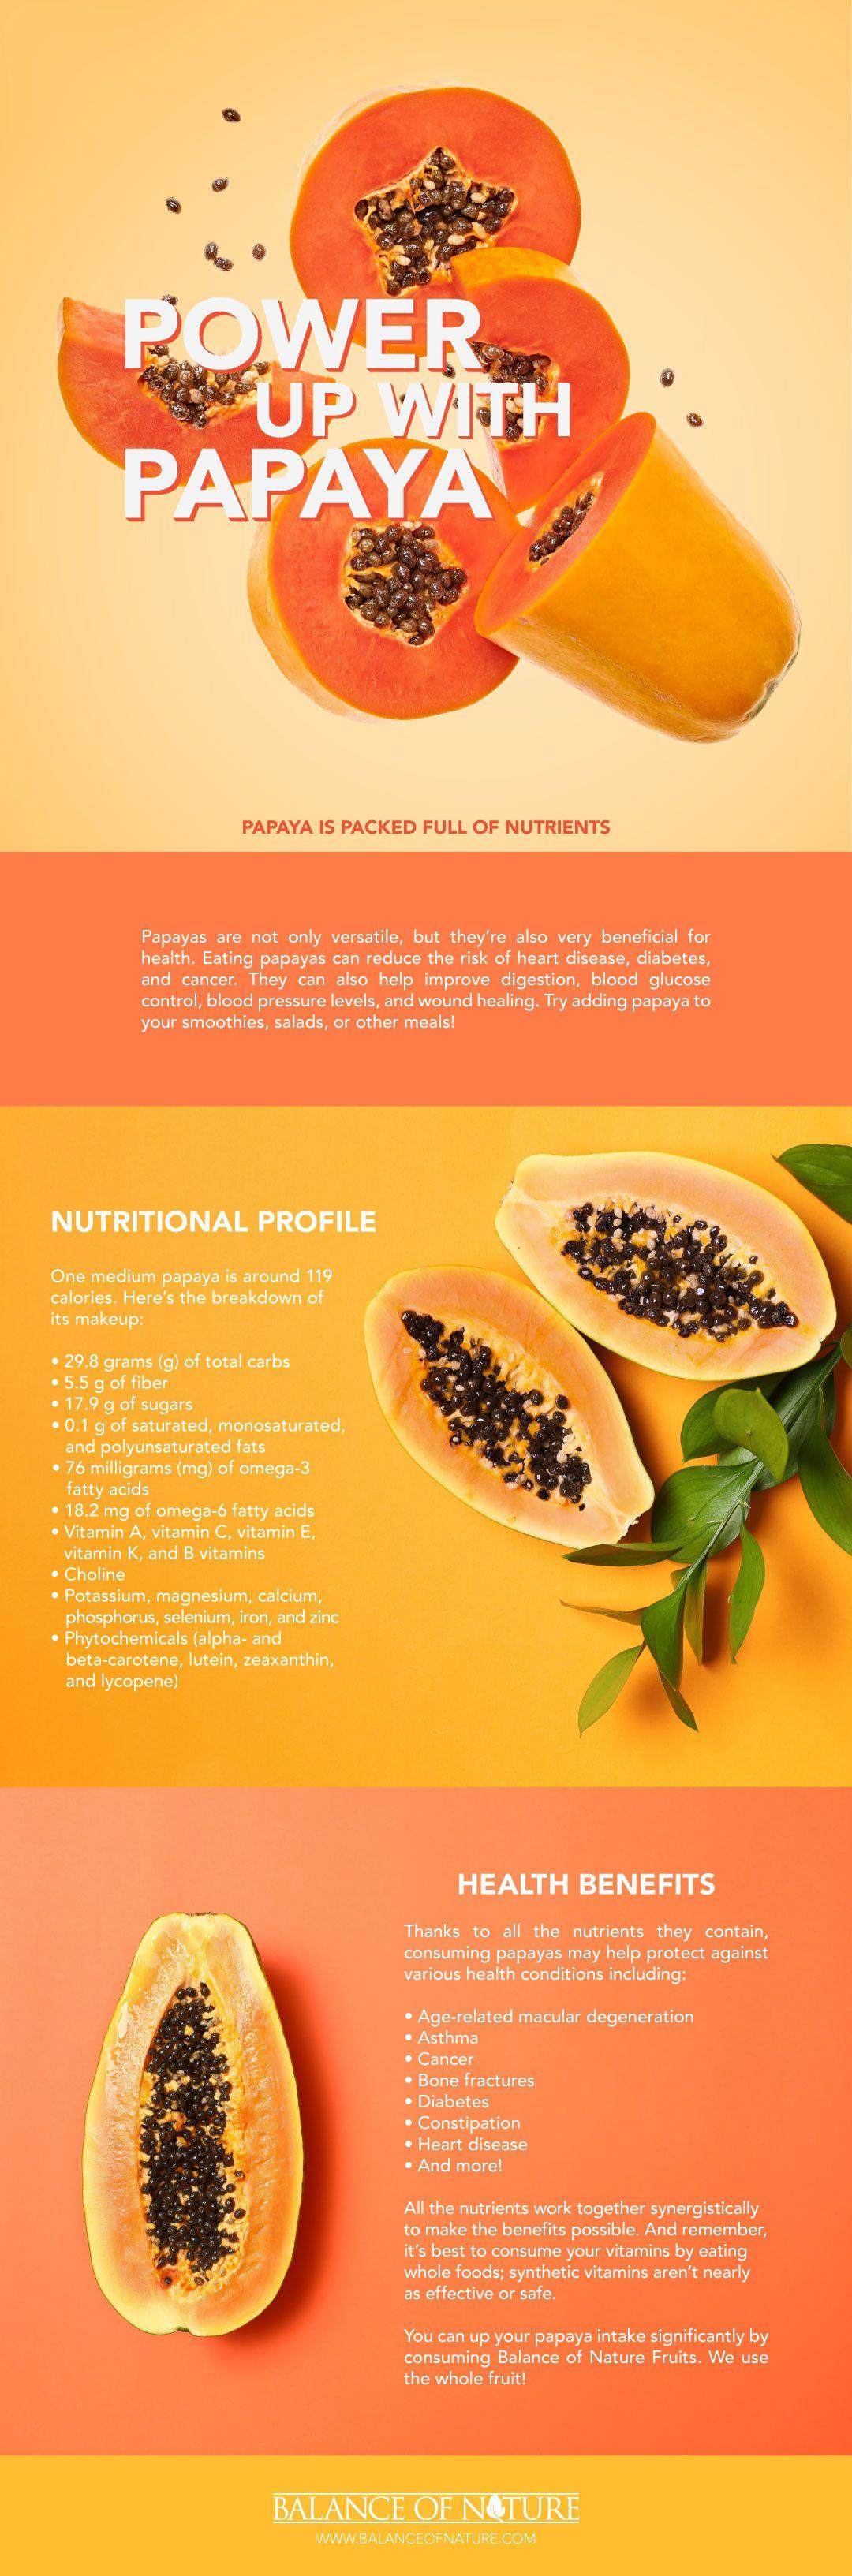 Papaya Benefits Infographic